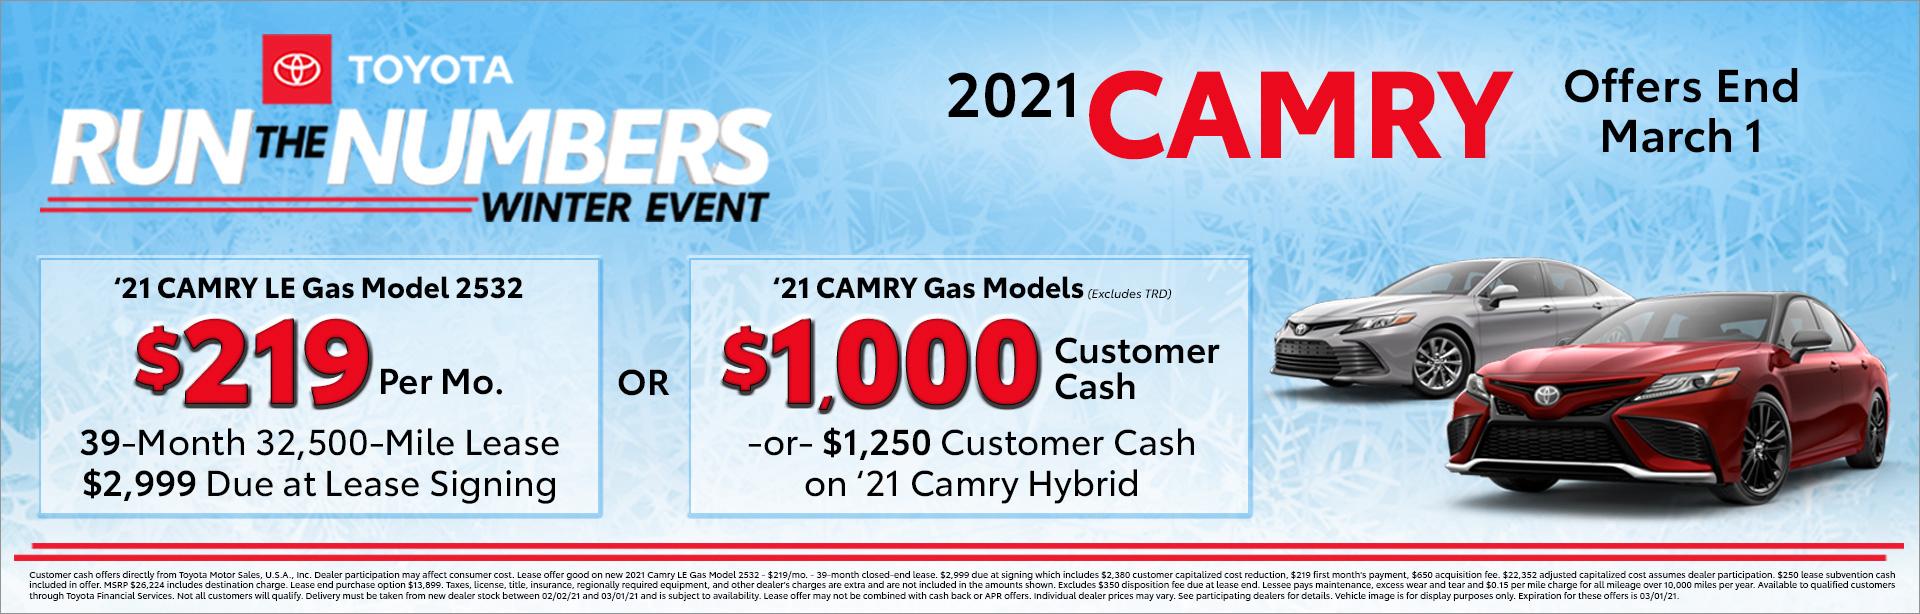 02-21_01_Cincinnati-February-2021-CIN-Camry-Run-The-Numbers_1920x614_5815_Camry-Hybrid-Camry_O_xta.jpeg